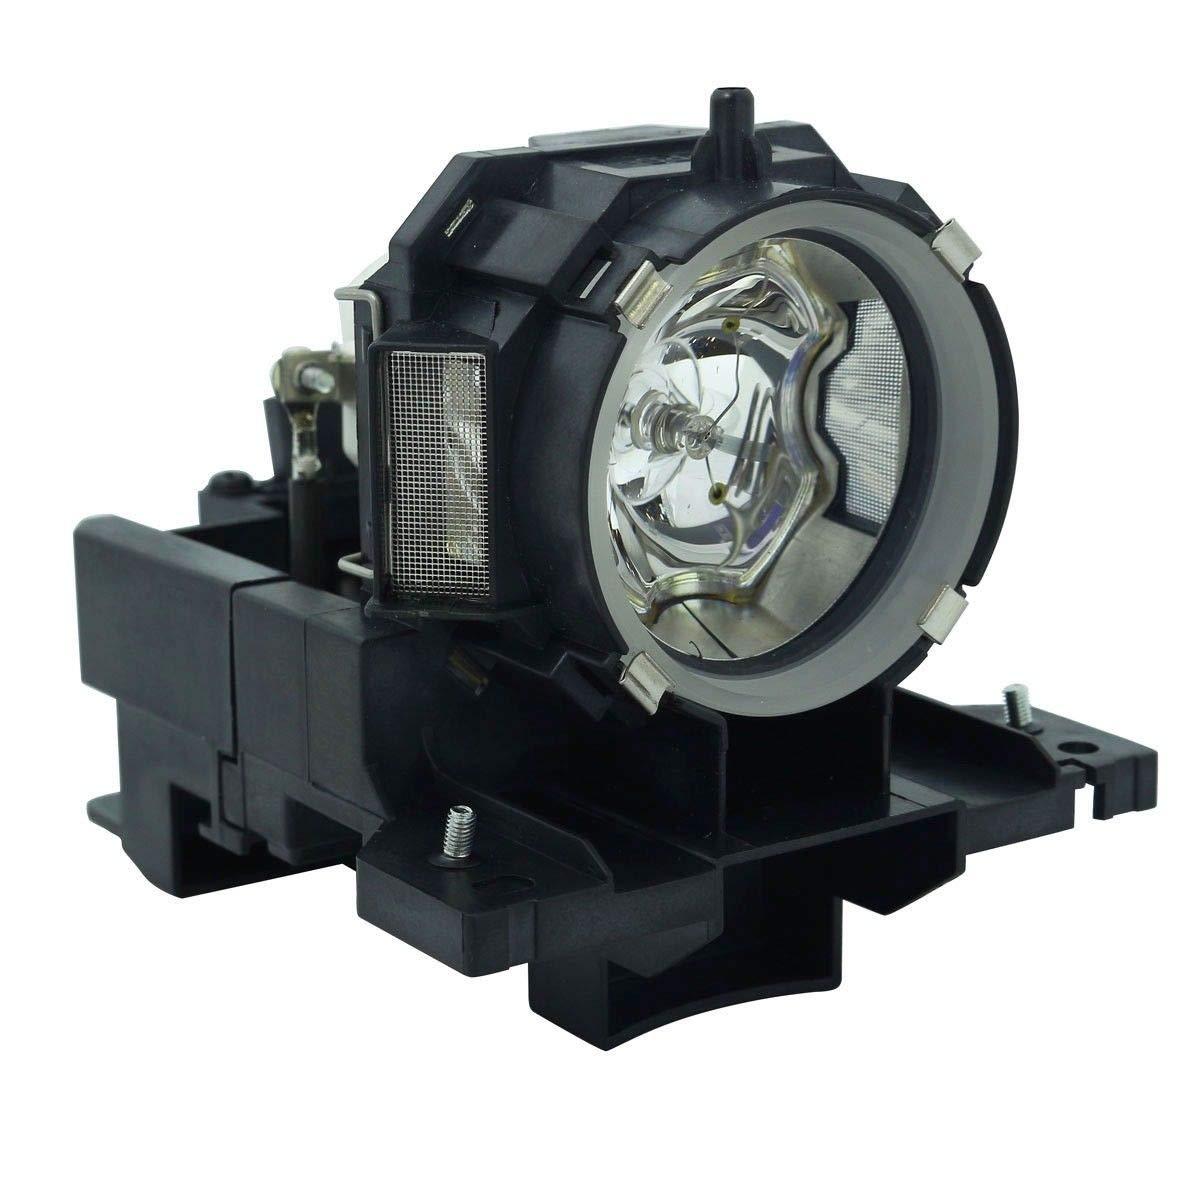 Supermait 456-8949H 交換用プロジェクターランプ/電球 ハウジング付き DUKANE ImagePro 8949H用   B07MXXRH21